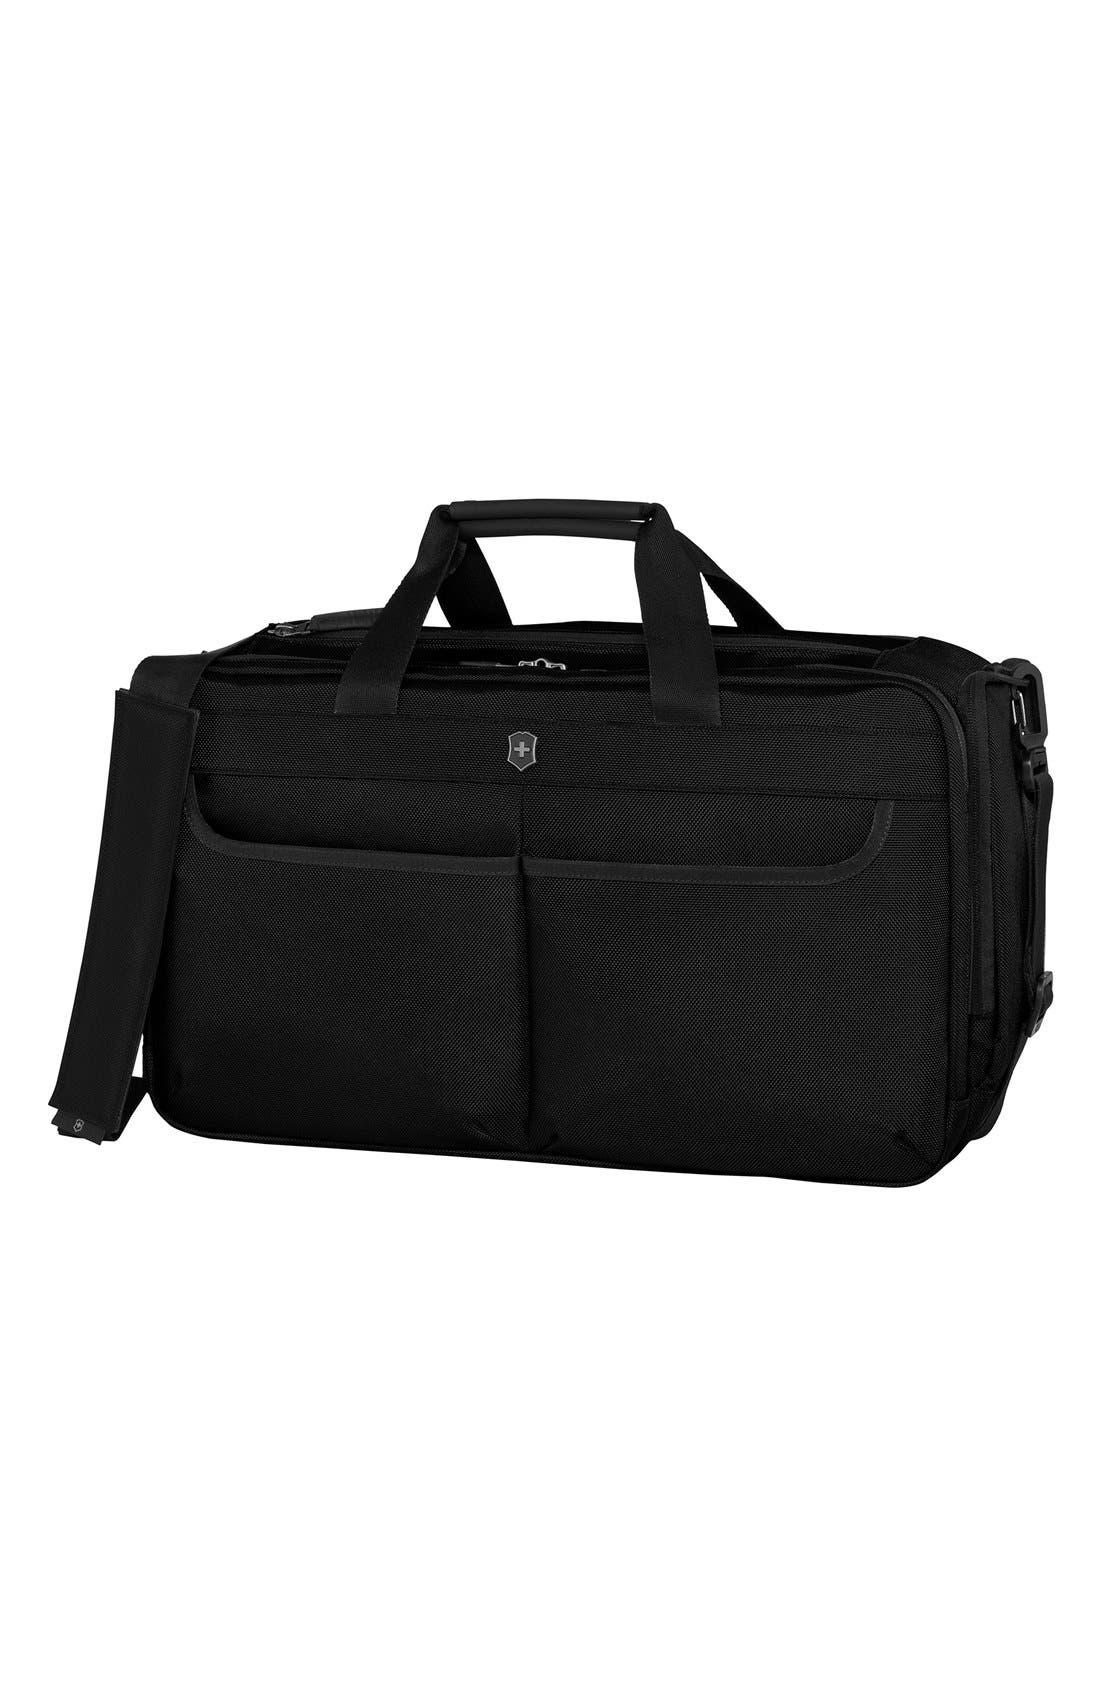 WT 5.0 Duffel Bag,                             Main thumbnail 1, color,